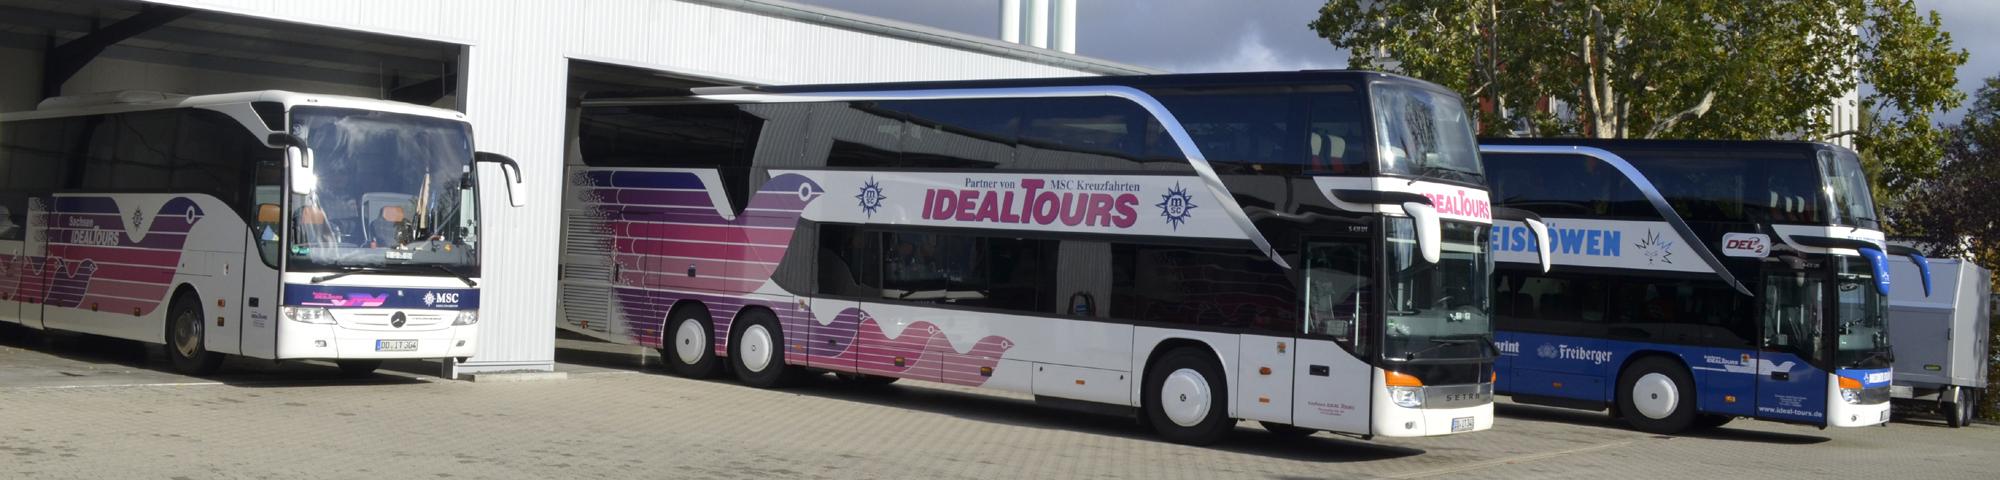 busunternehmen sachsen idealtours gmbh bus mieten in. Black Bedroom Furniture Sets. Home Design Ideas